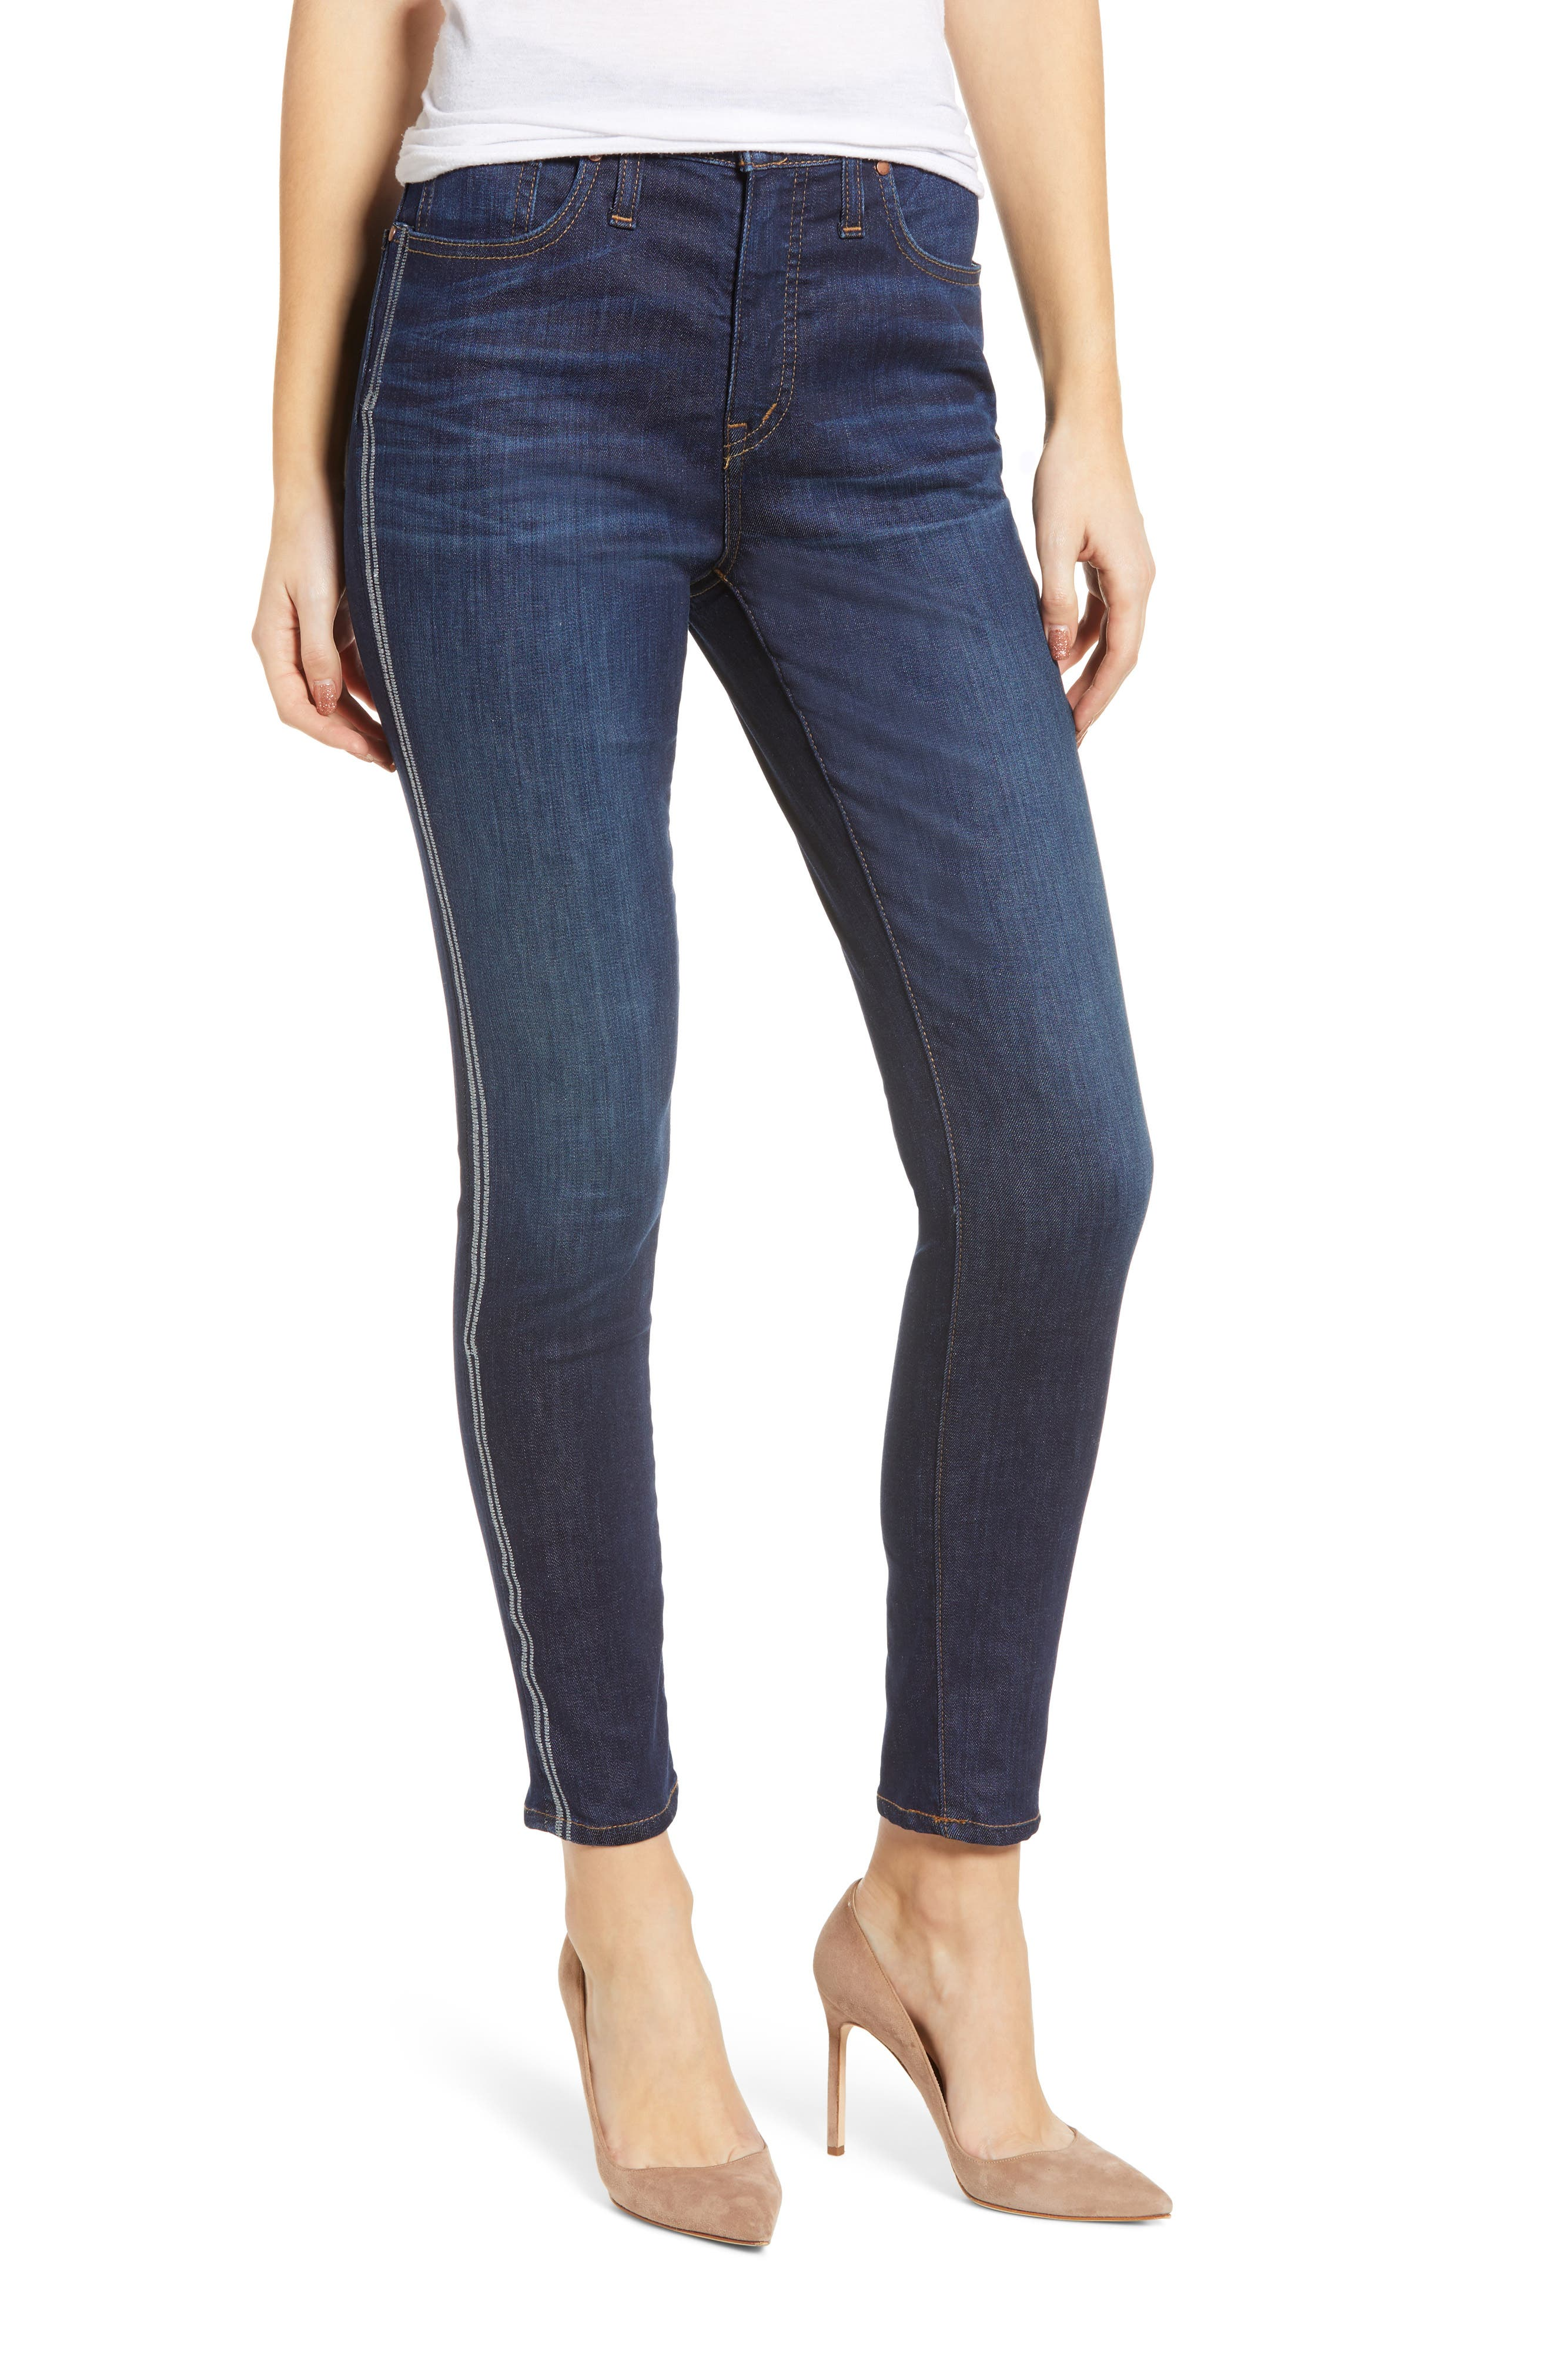 Sierra High Waist Ankle Skinny Jeans, Main, color, FRANCIS